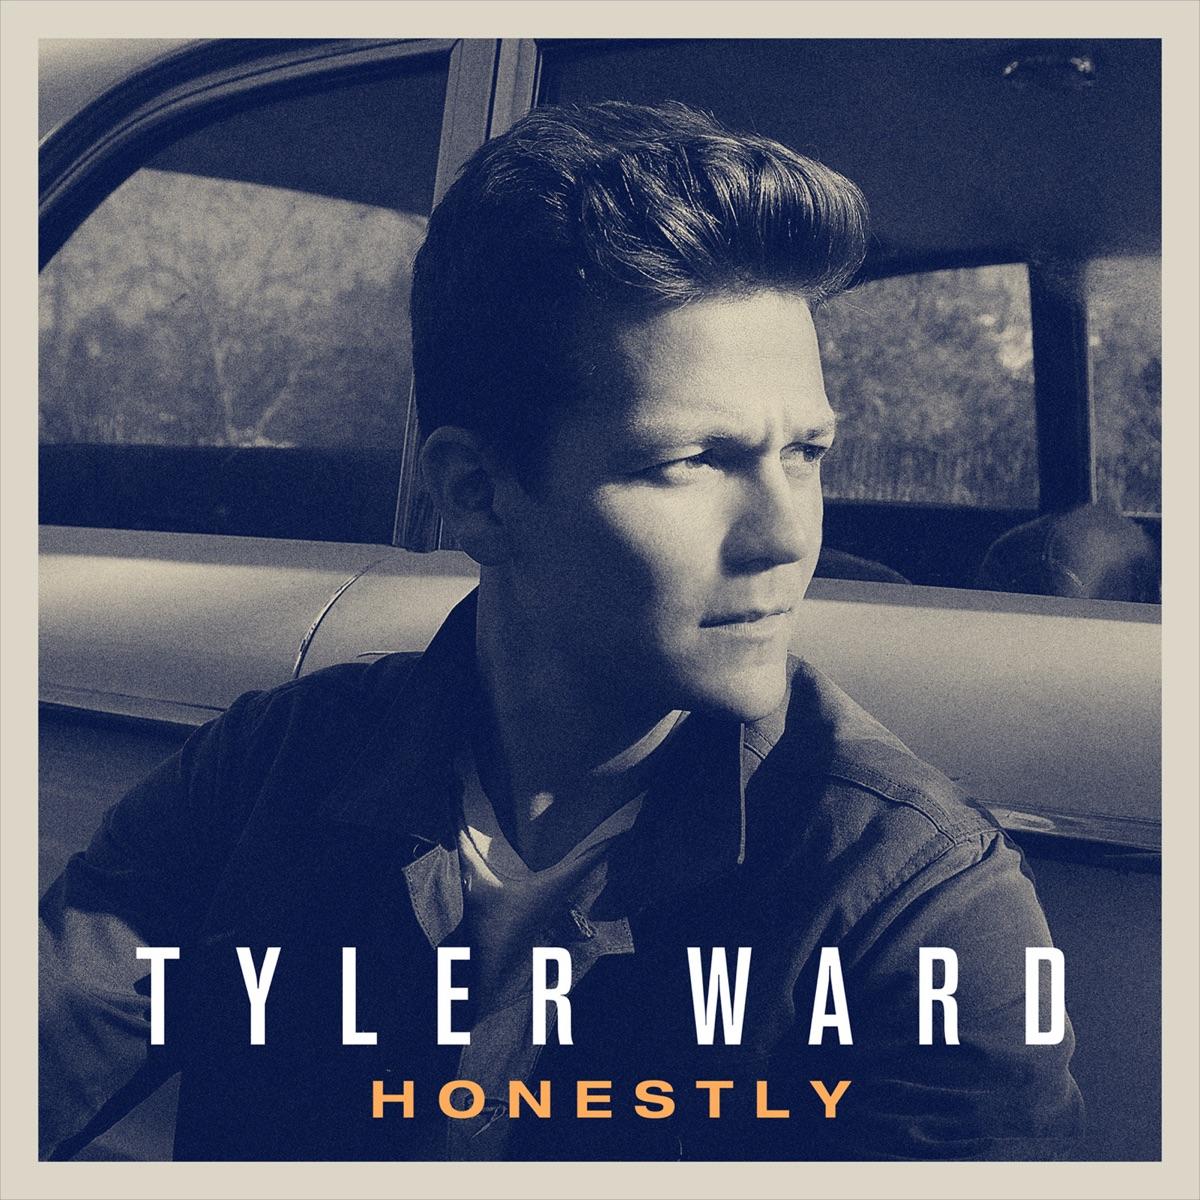 Honestly Tyler Ward CD cover